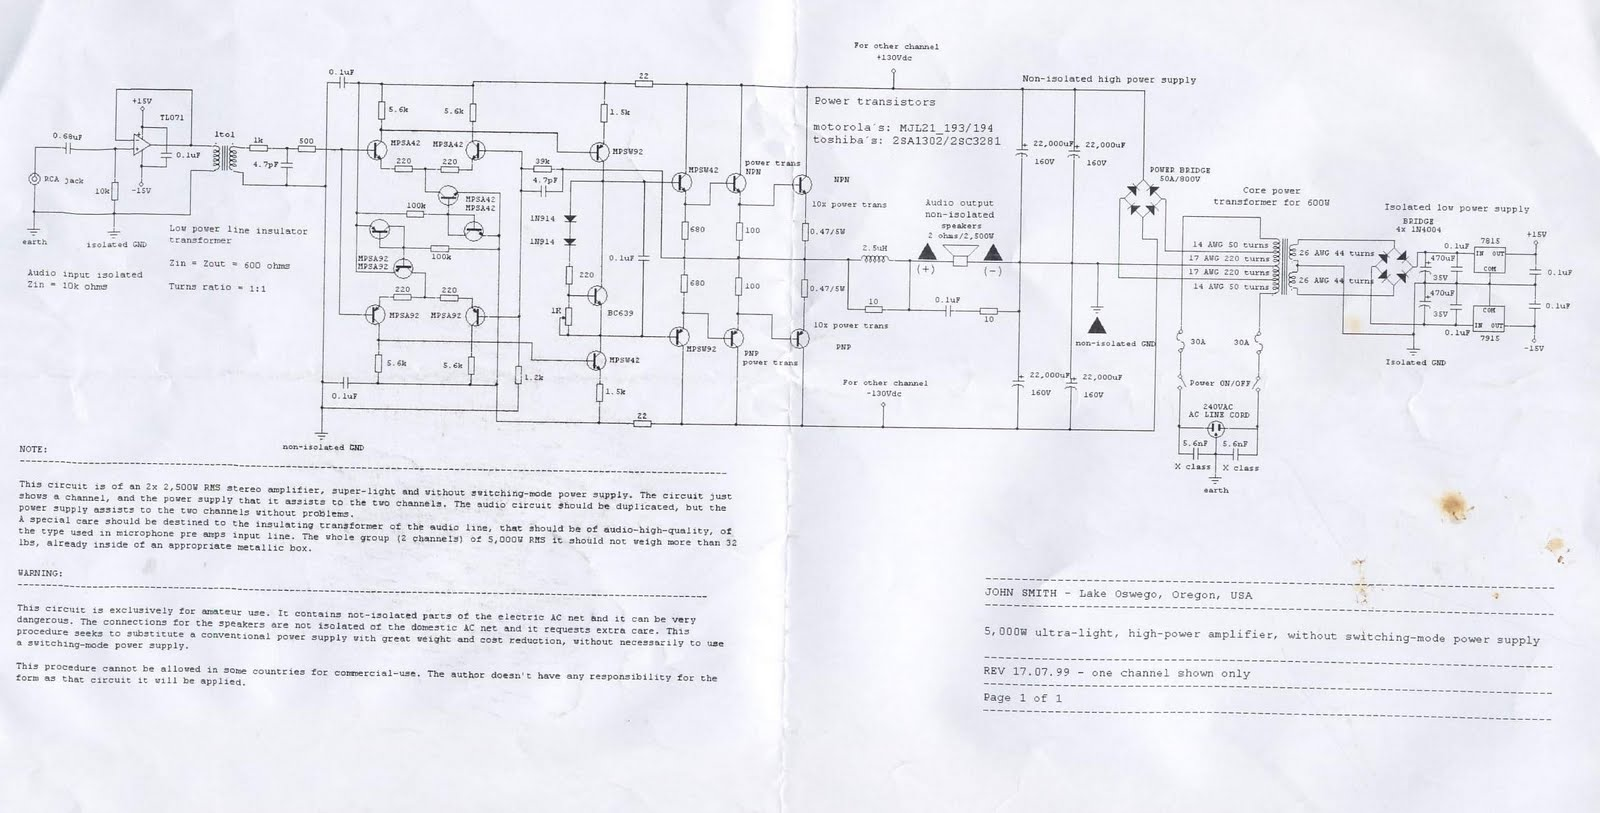 Astonishing Basically Amplifier Circuits Diagram Ipod Wiring Circuit Diagram Wiring Cloud Rineaidewilluminateatxorg